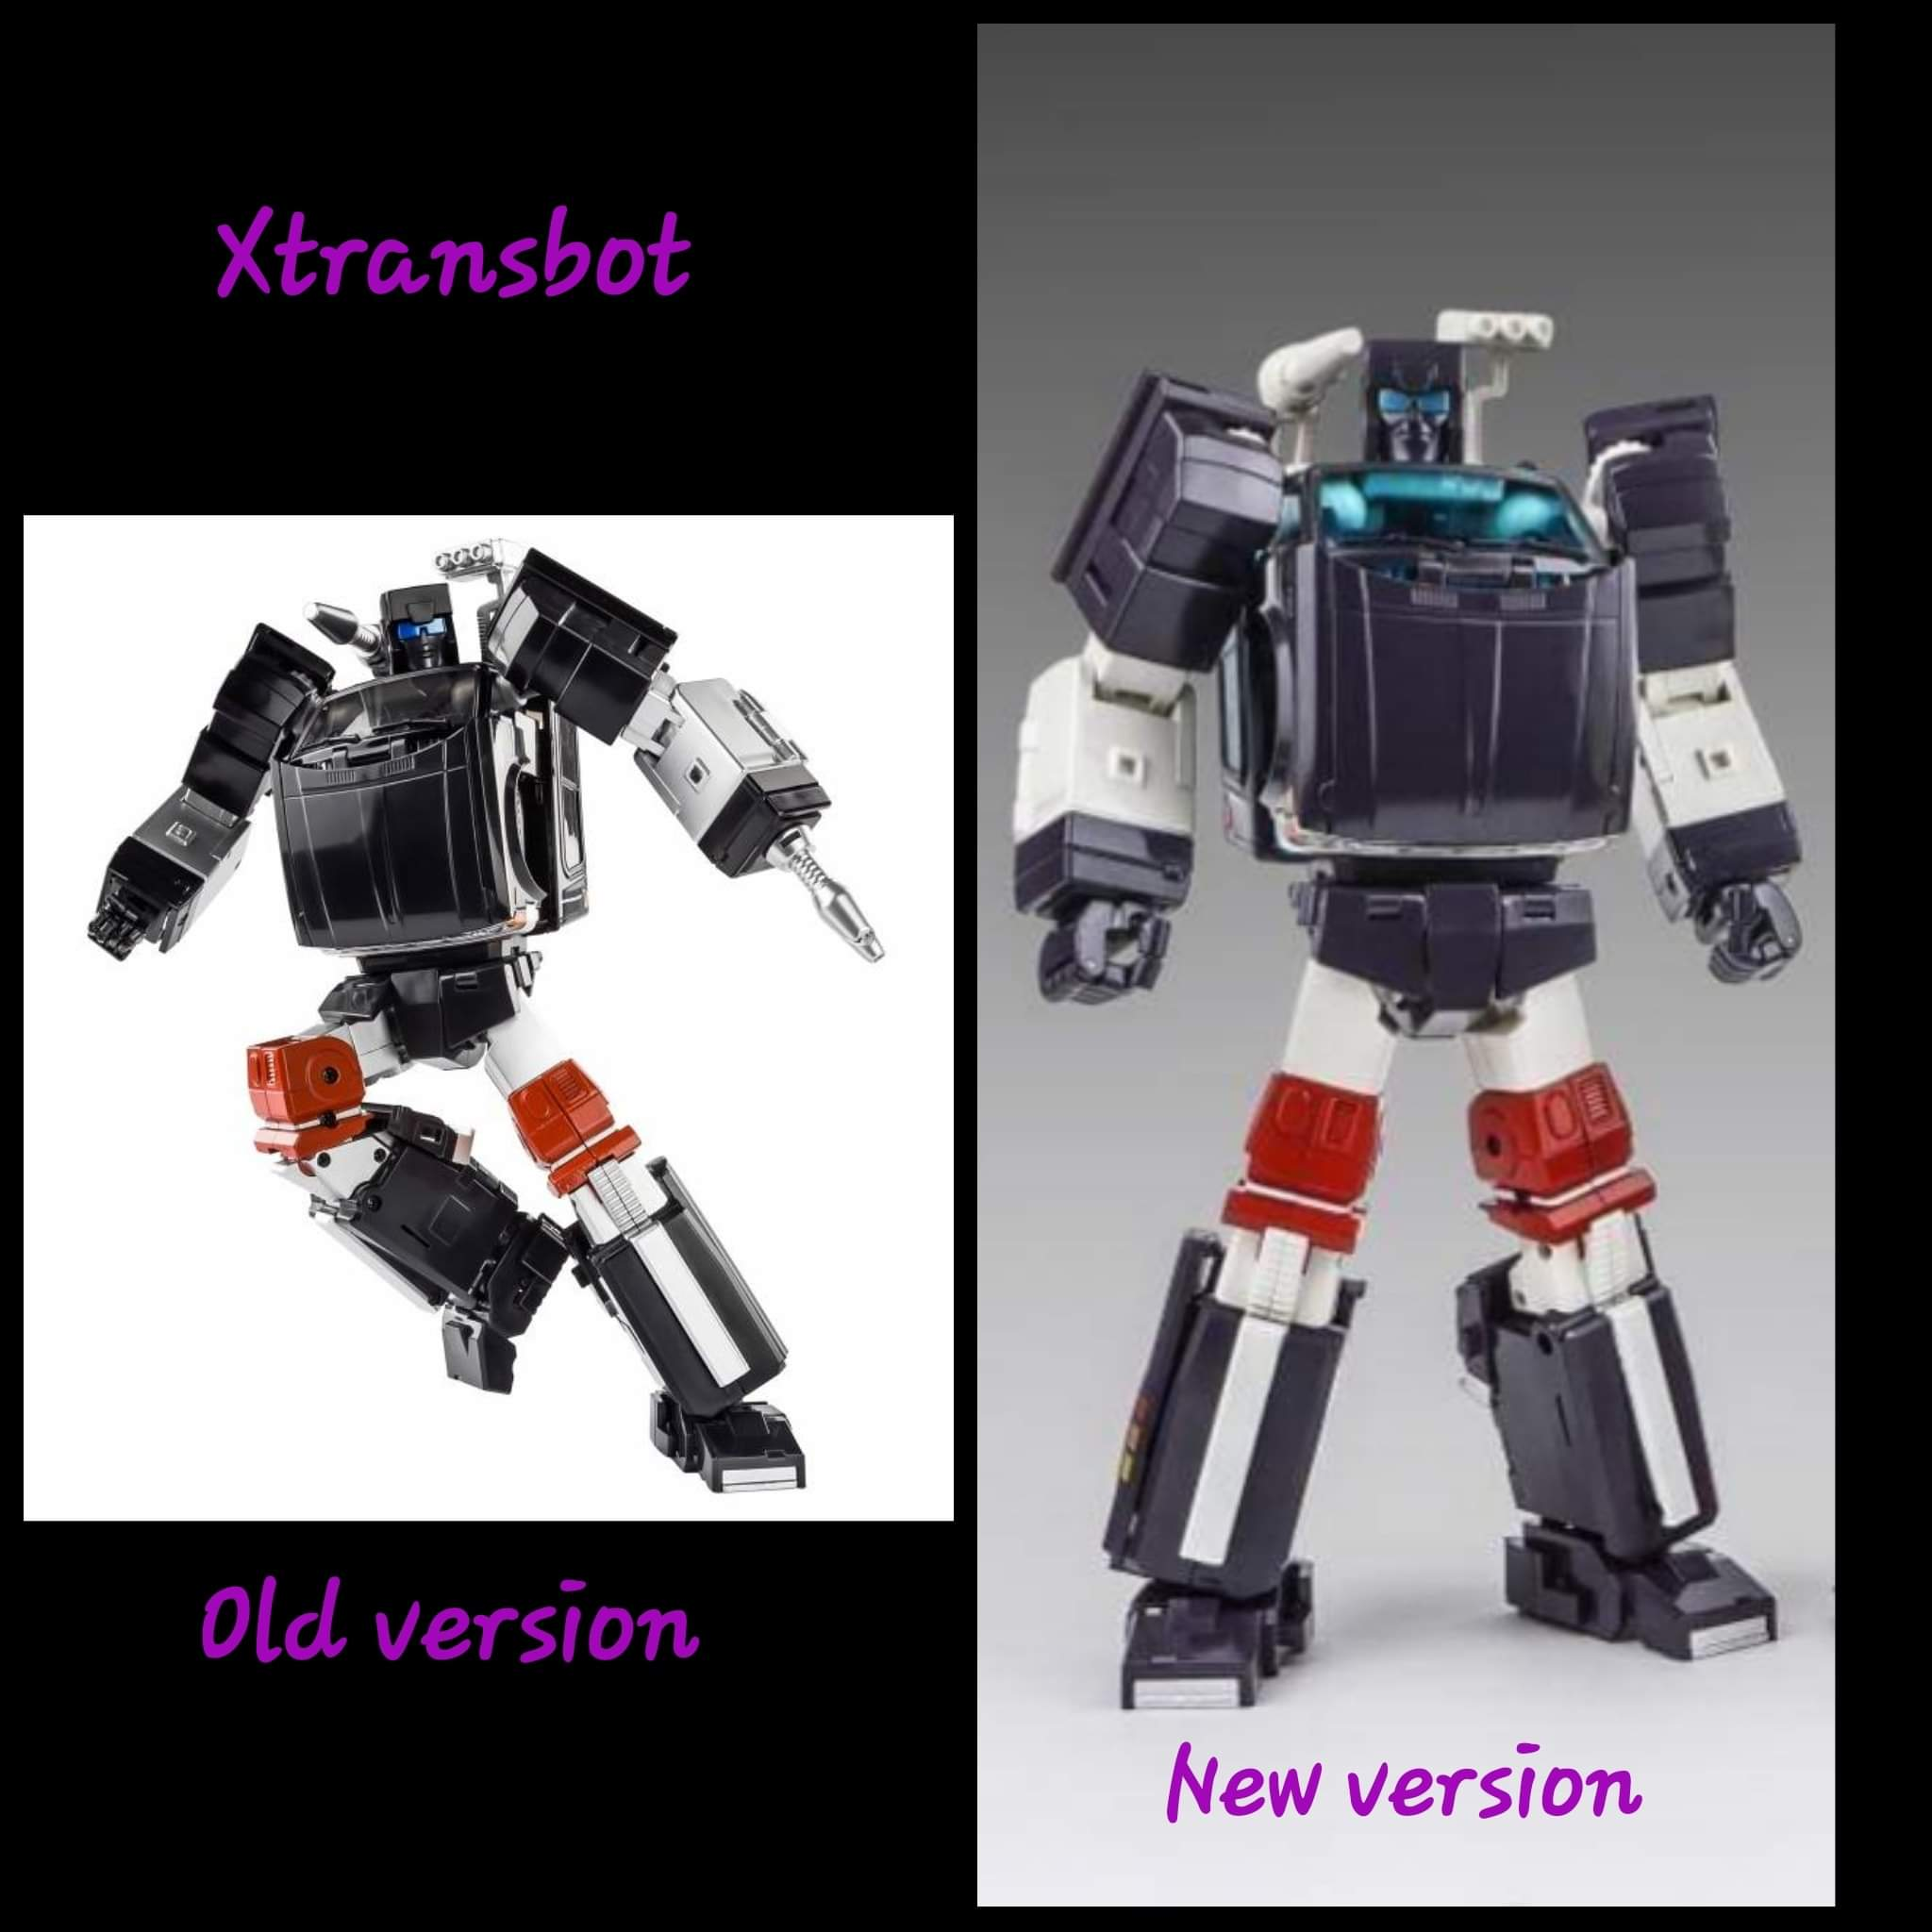 [X-Transbots] Produit Tiers - Jouet MX-VIII Aegis - aka Trailbreaker/Glouton - Page 2 GToRmr0J_o